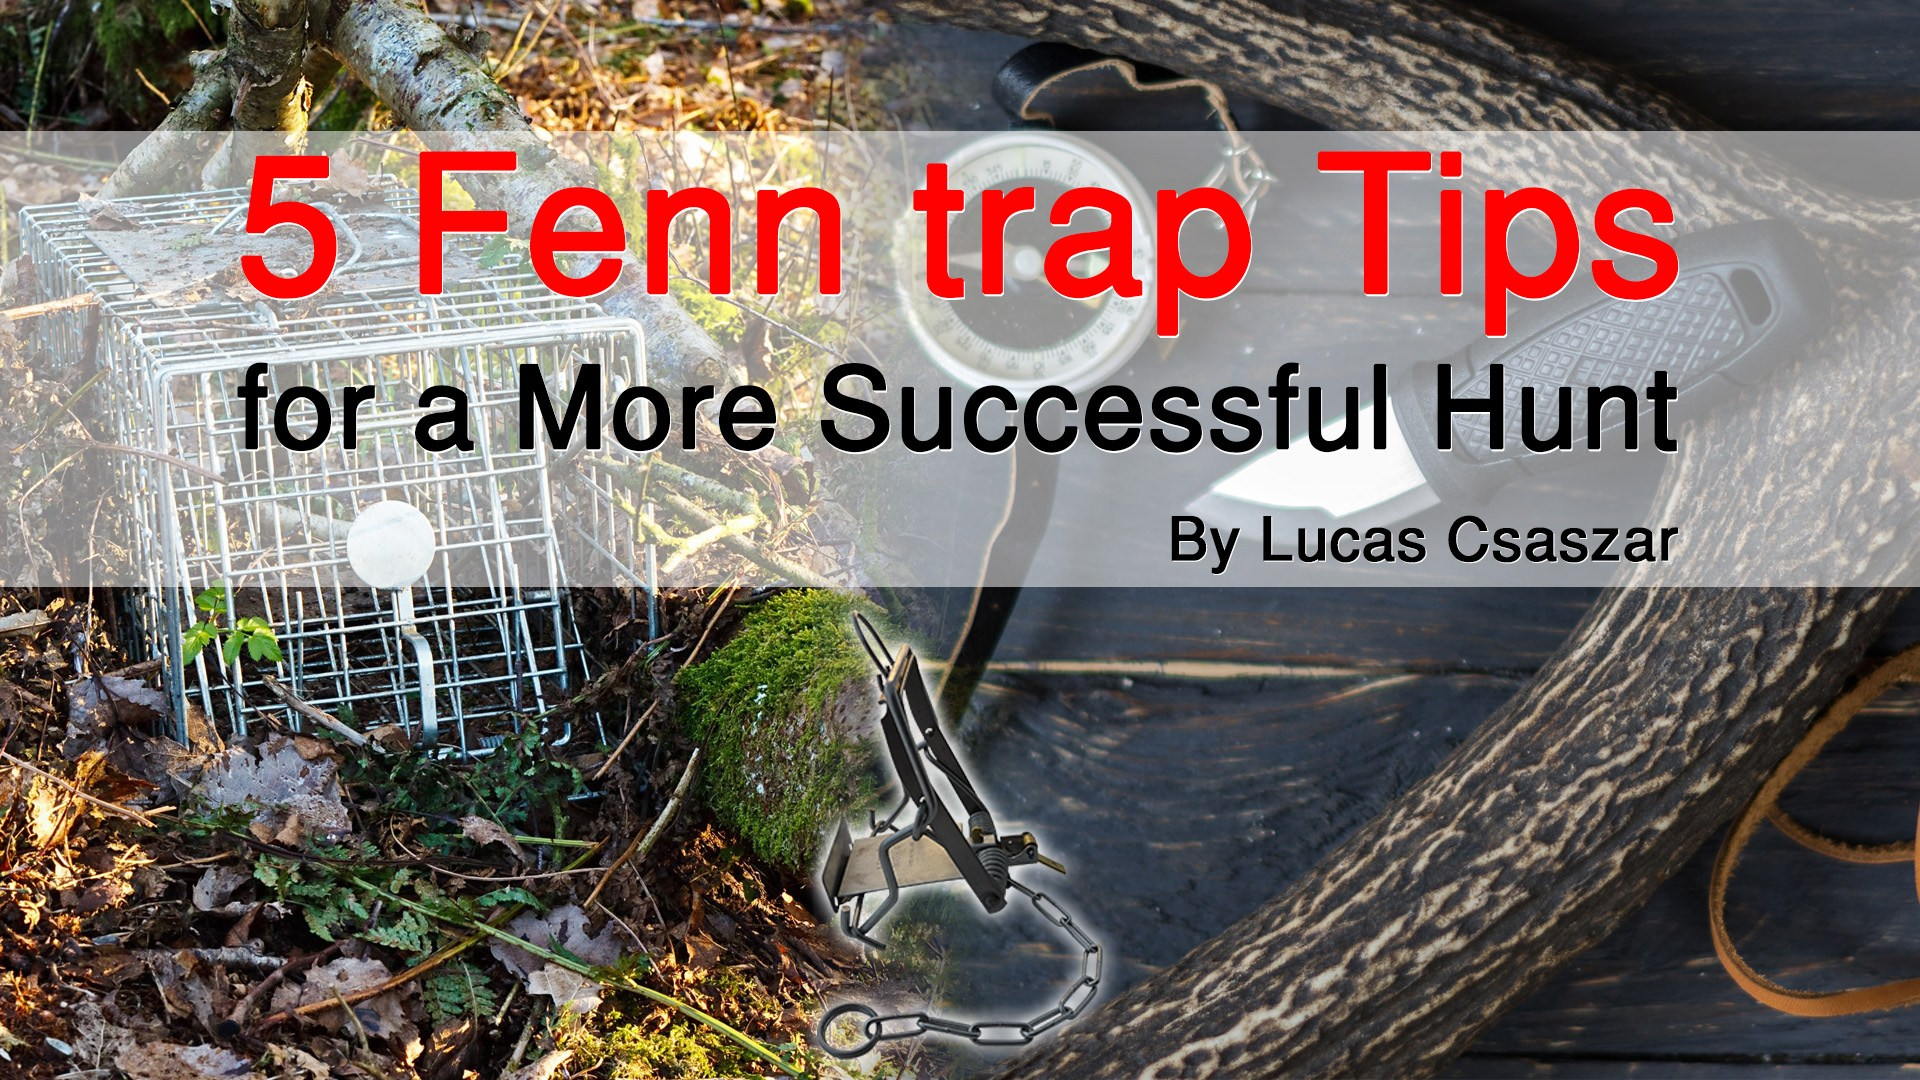 5 Fenn trap Tips for a More Successful Hunt By Lucas Csaszar